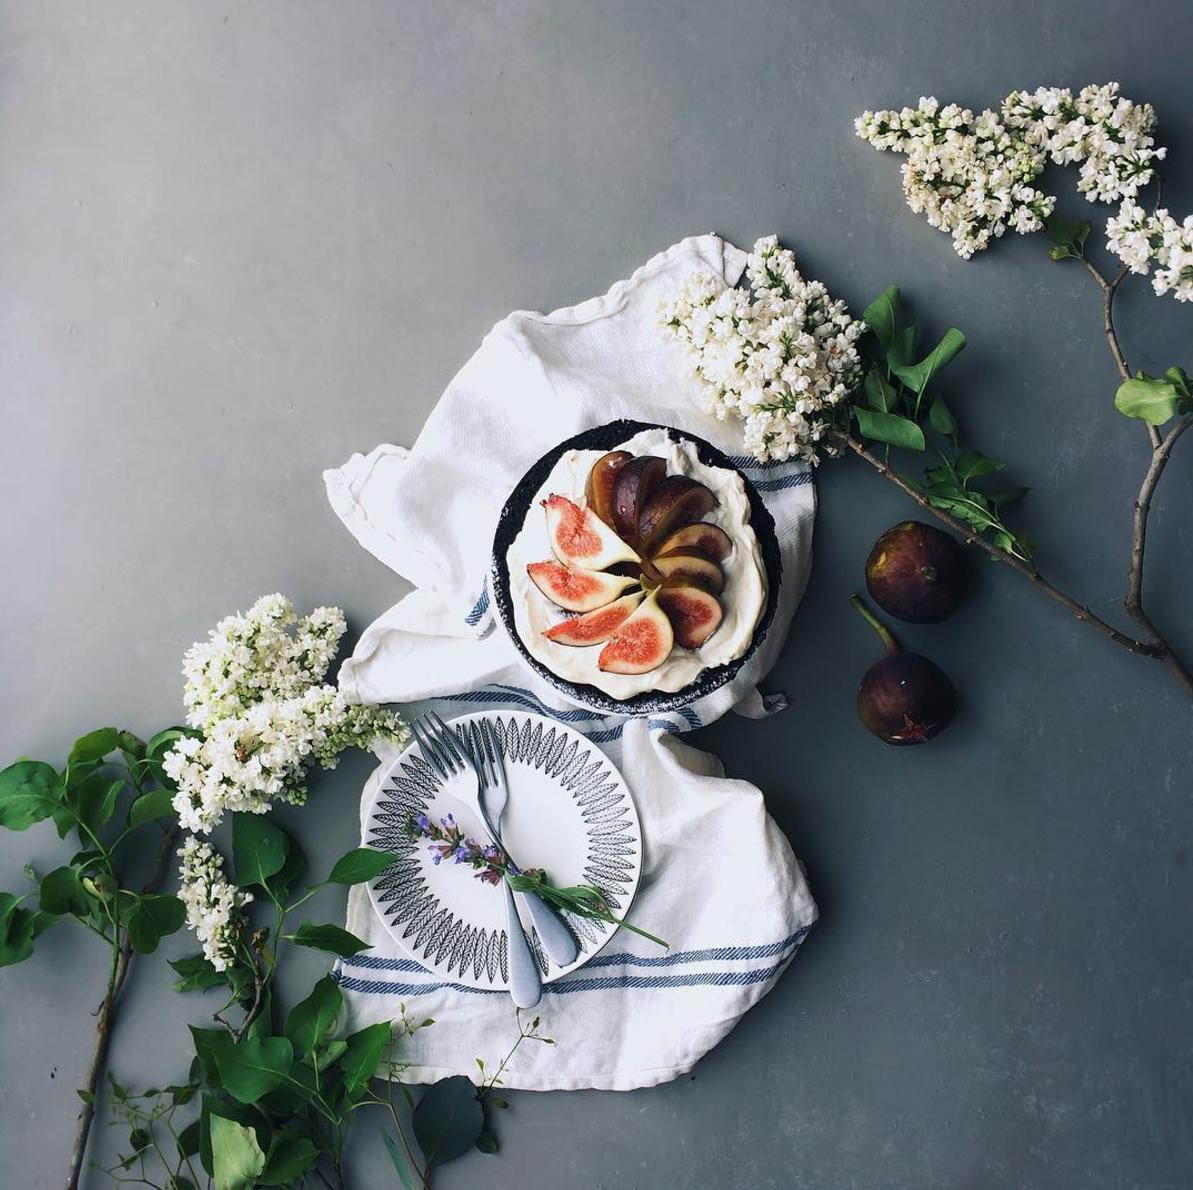 Plum Cake and Lilacs by Yukiko Masuda